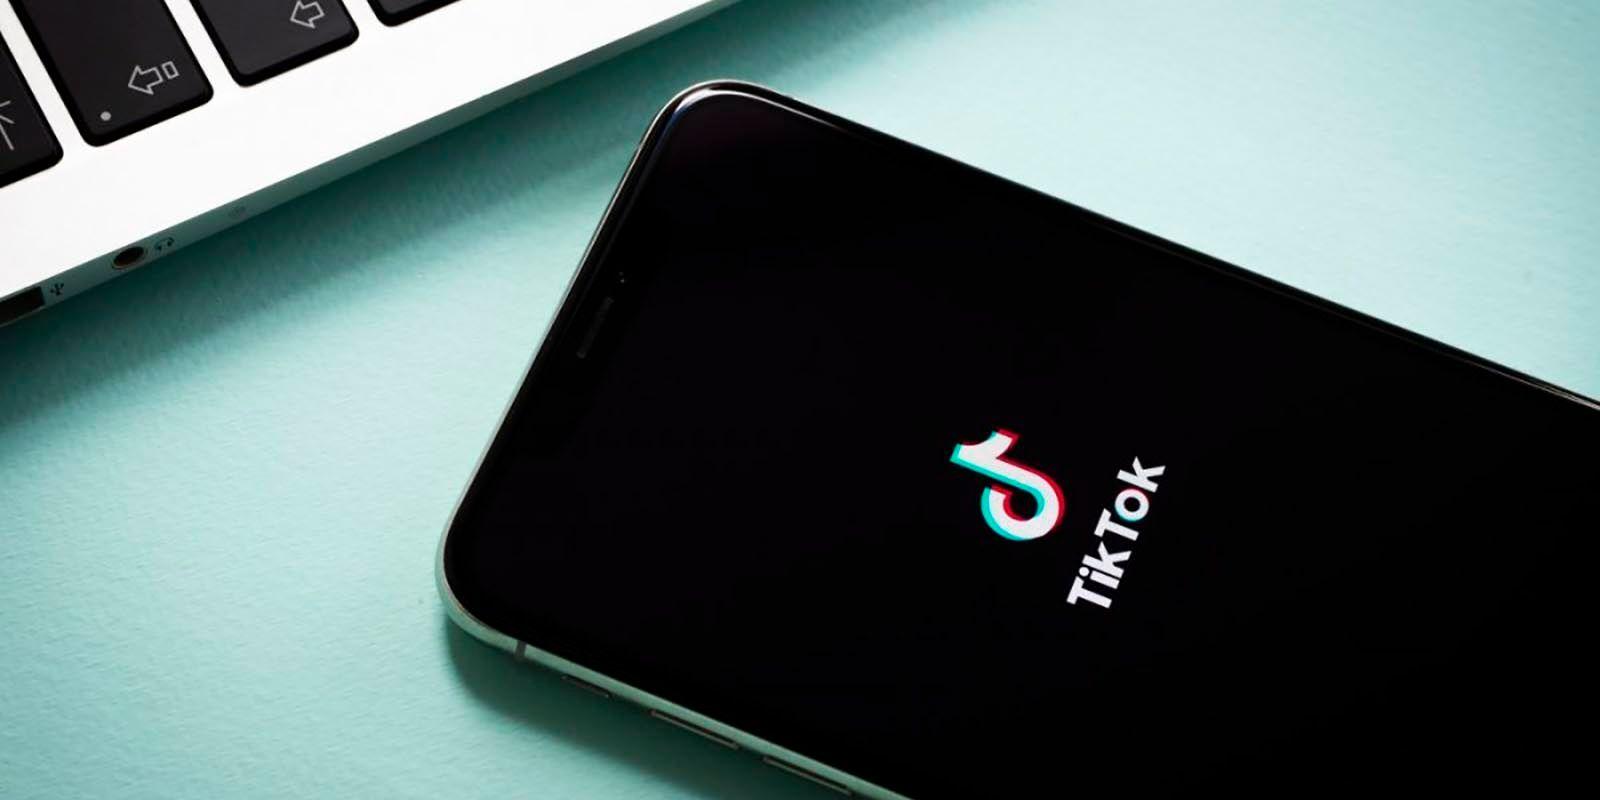 Dispositivo no admite efecto TikTok